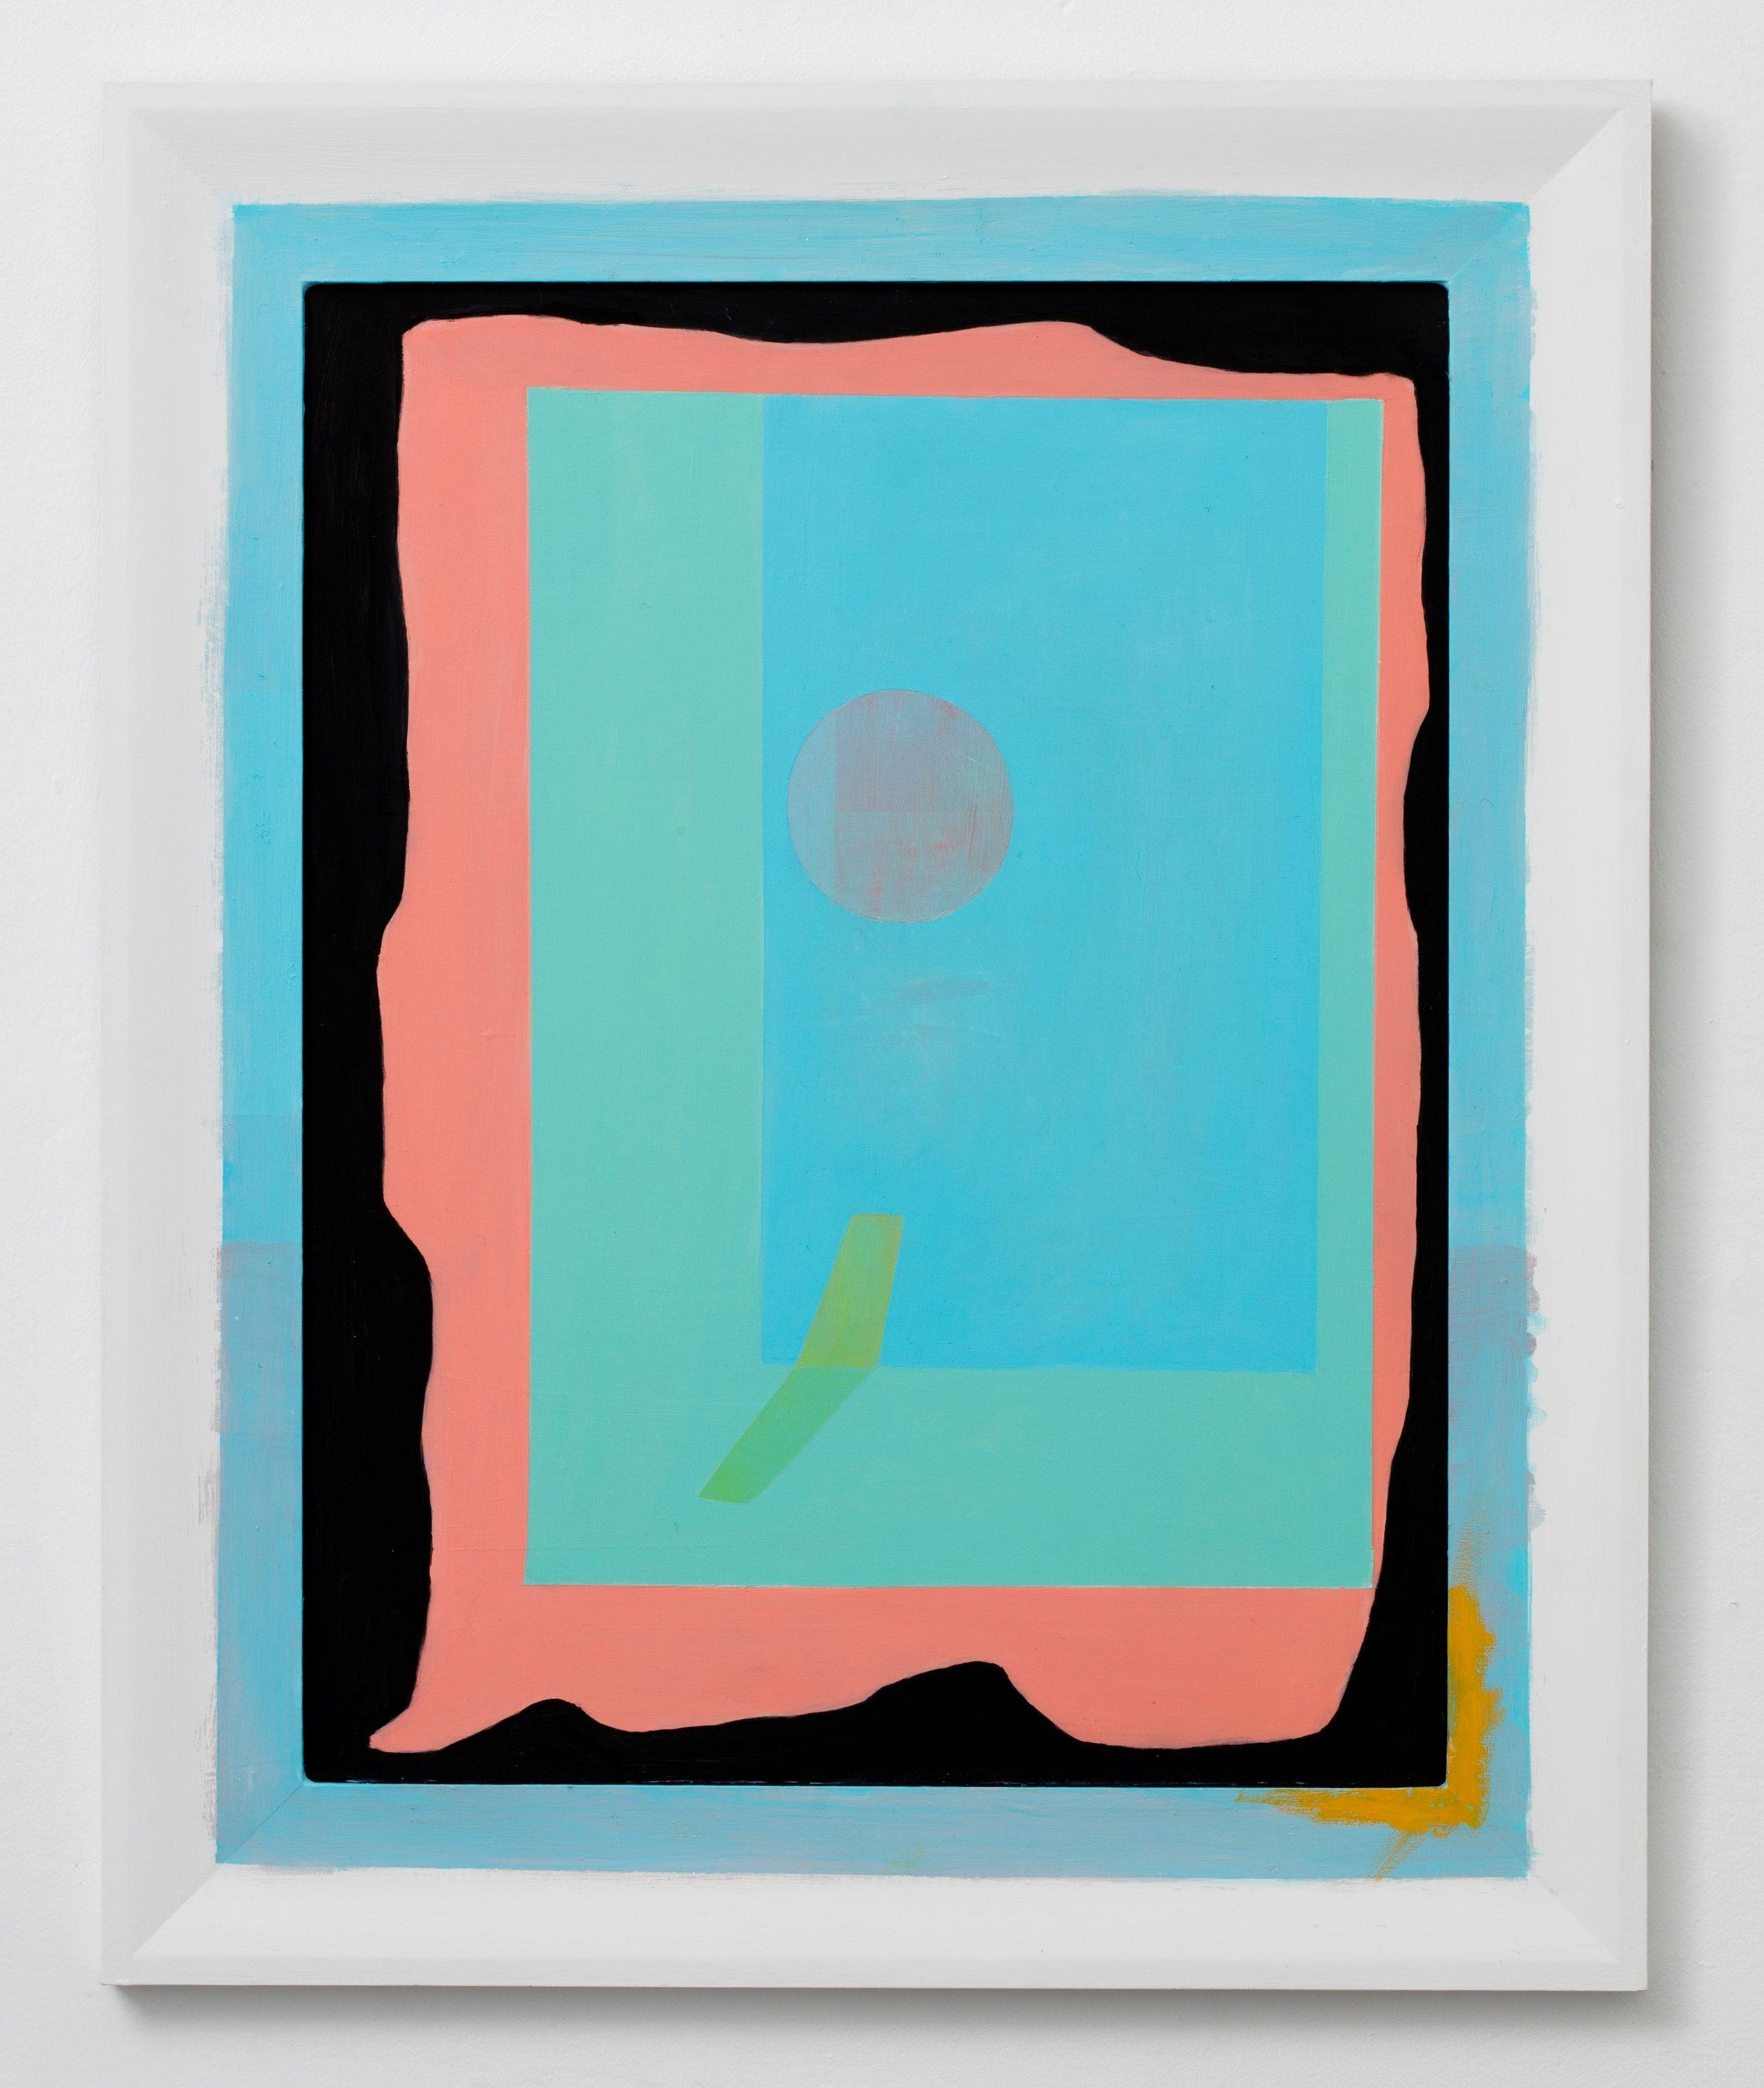 Saskia Leek, Untitled 2016, oil and gesso on aluminium board